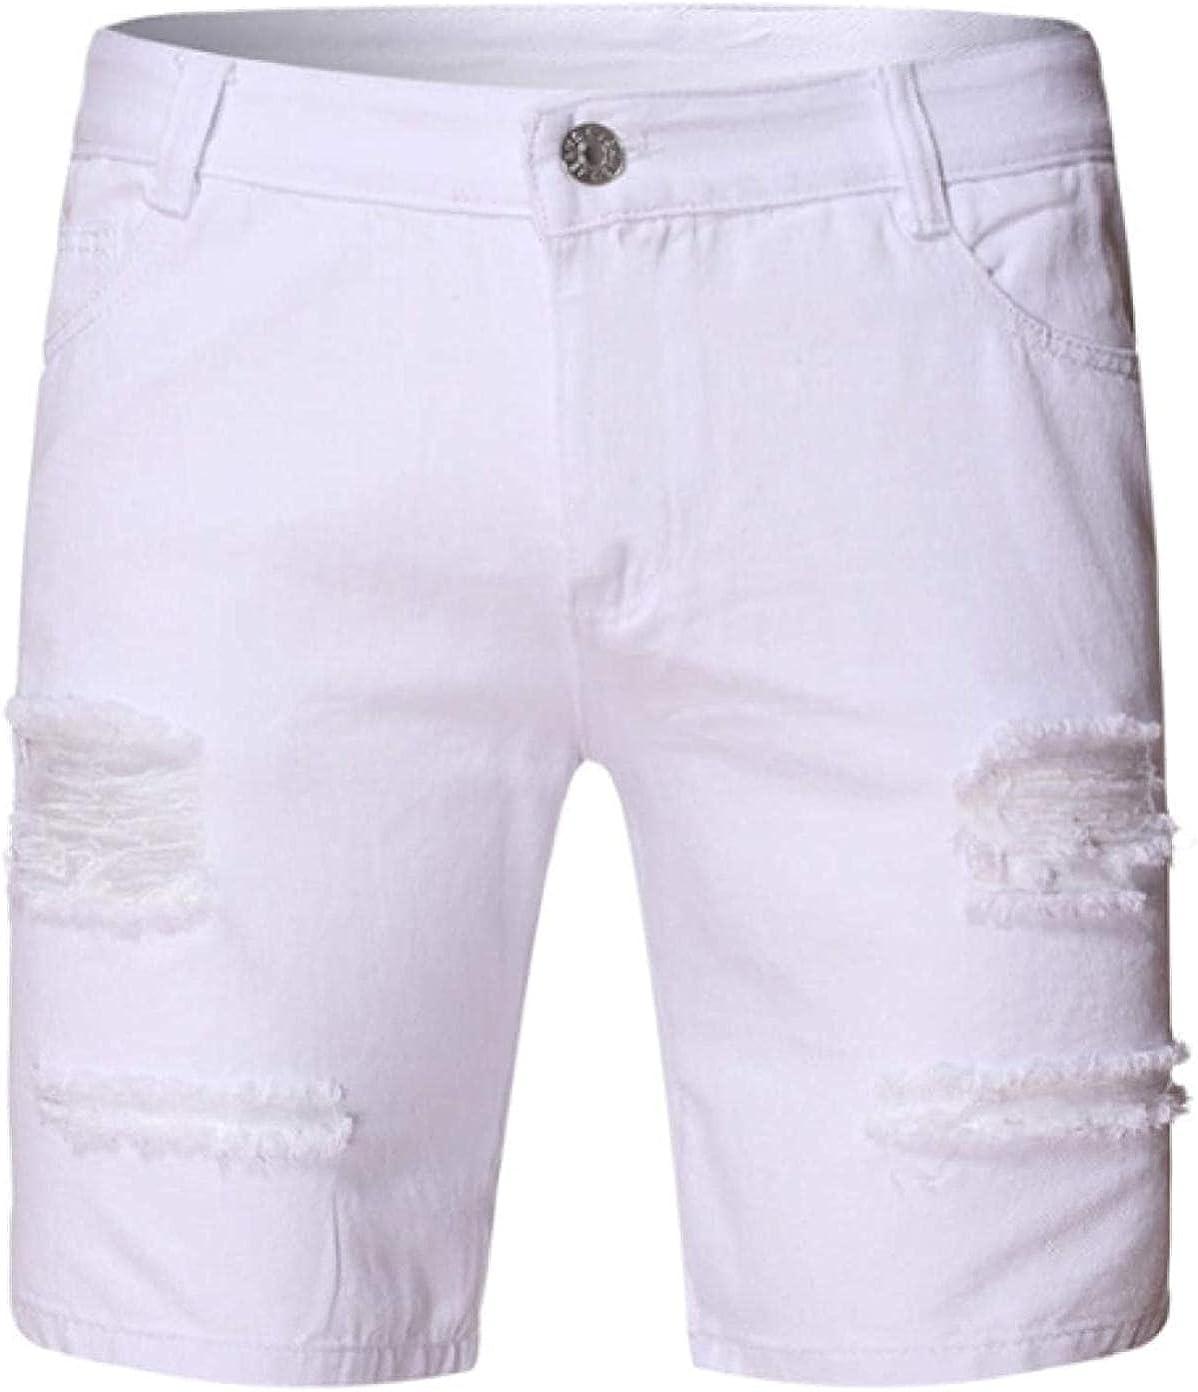 ZYUEER Men's Denim Shorts Ripped Holes Torn Edges Stretch Straight Slim-fit Zipper